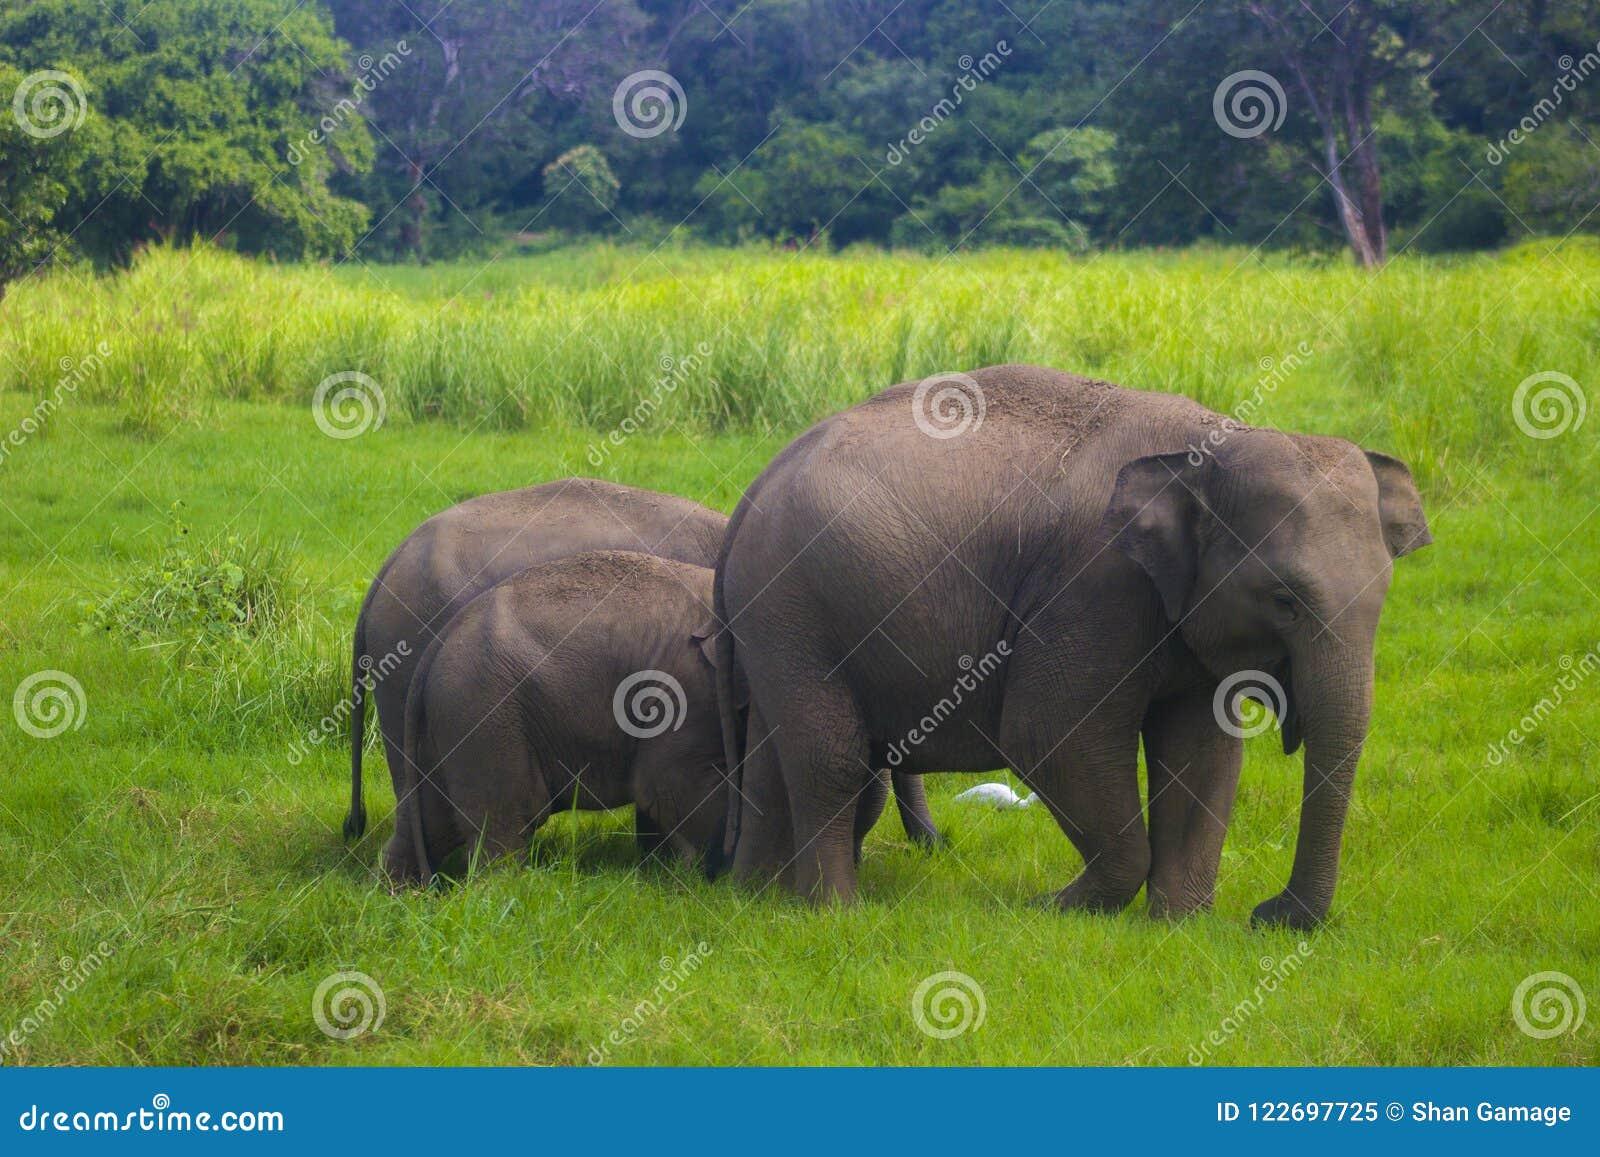 Parque nacional do minneriya selvagem asiático de Eliphant - de Sri Lanka